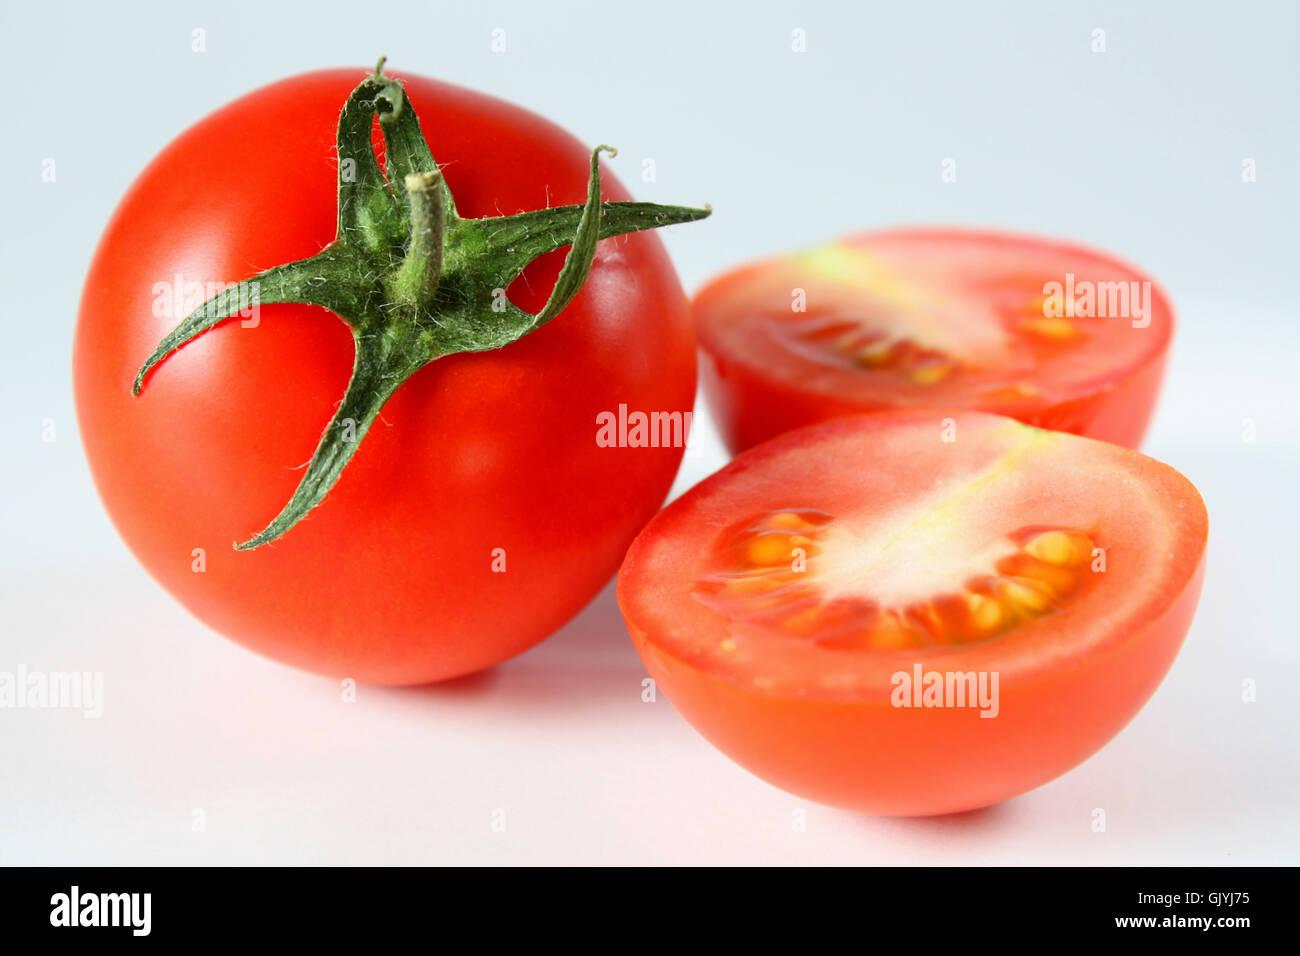 vitamine vegetable rich in vitamins - Stock Image